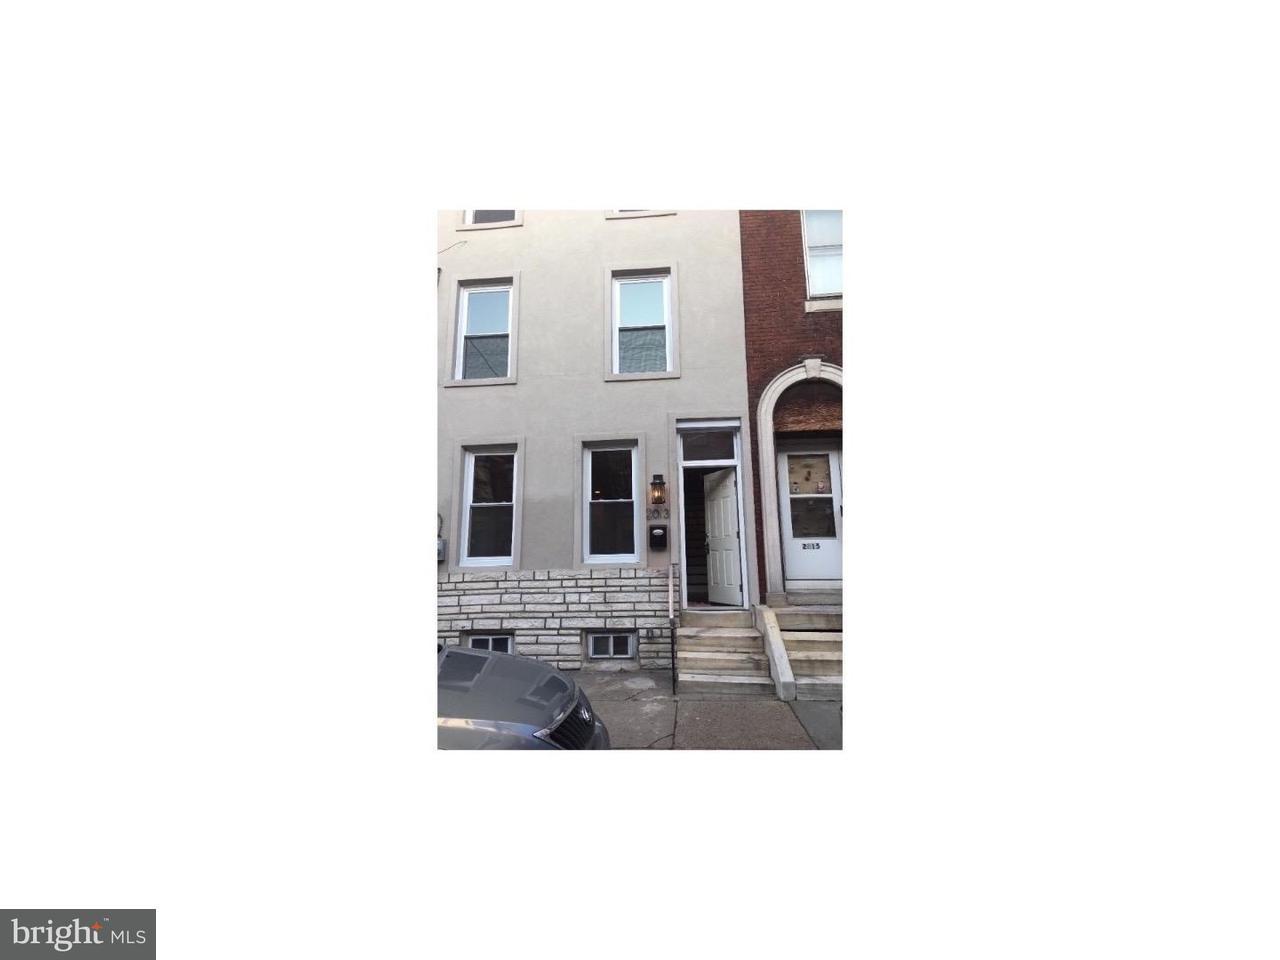 2013 E Dauphin Philadelphia, PA 19125